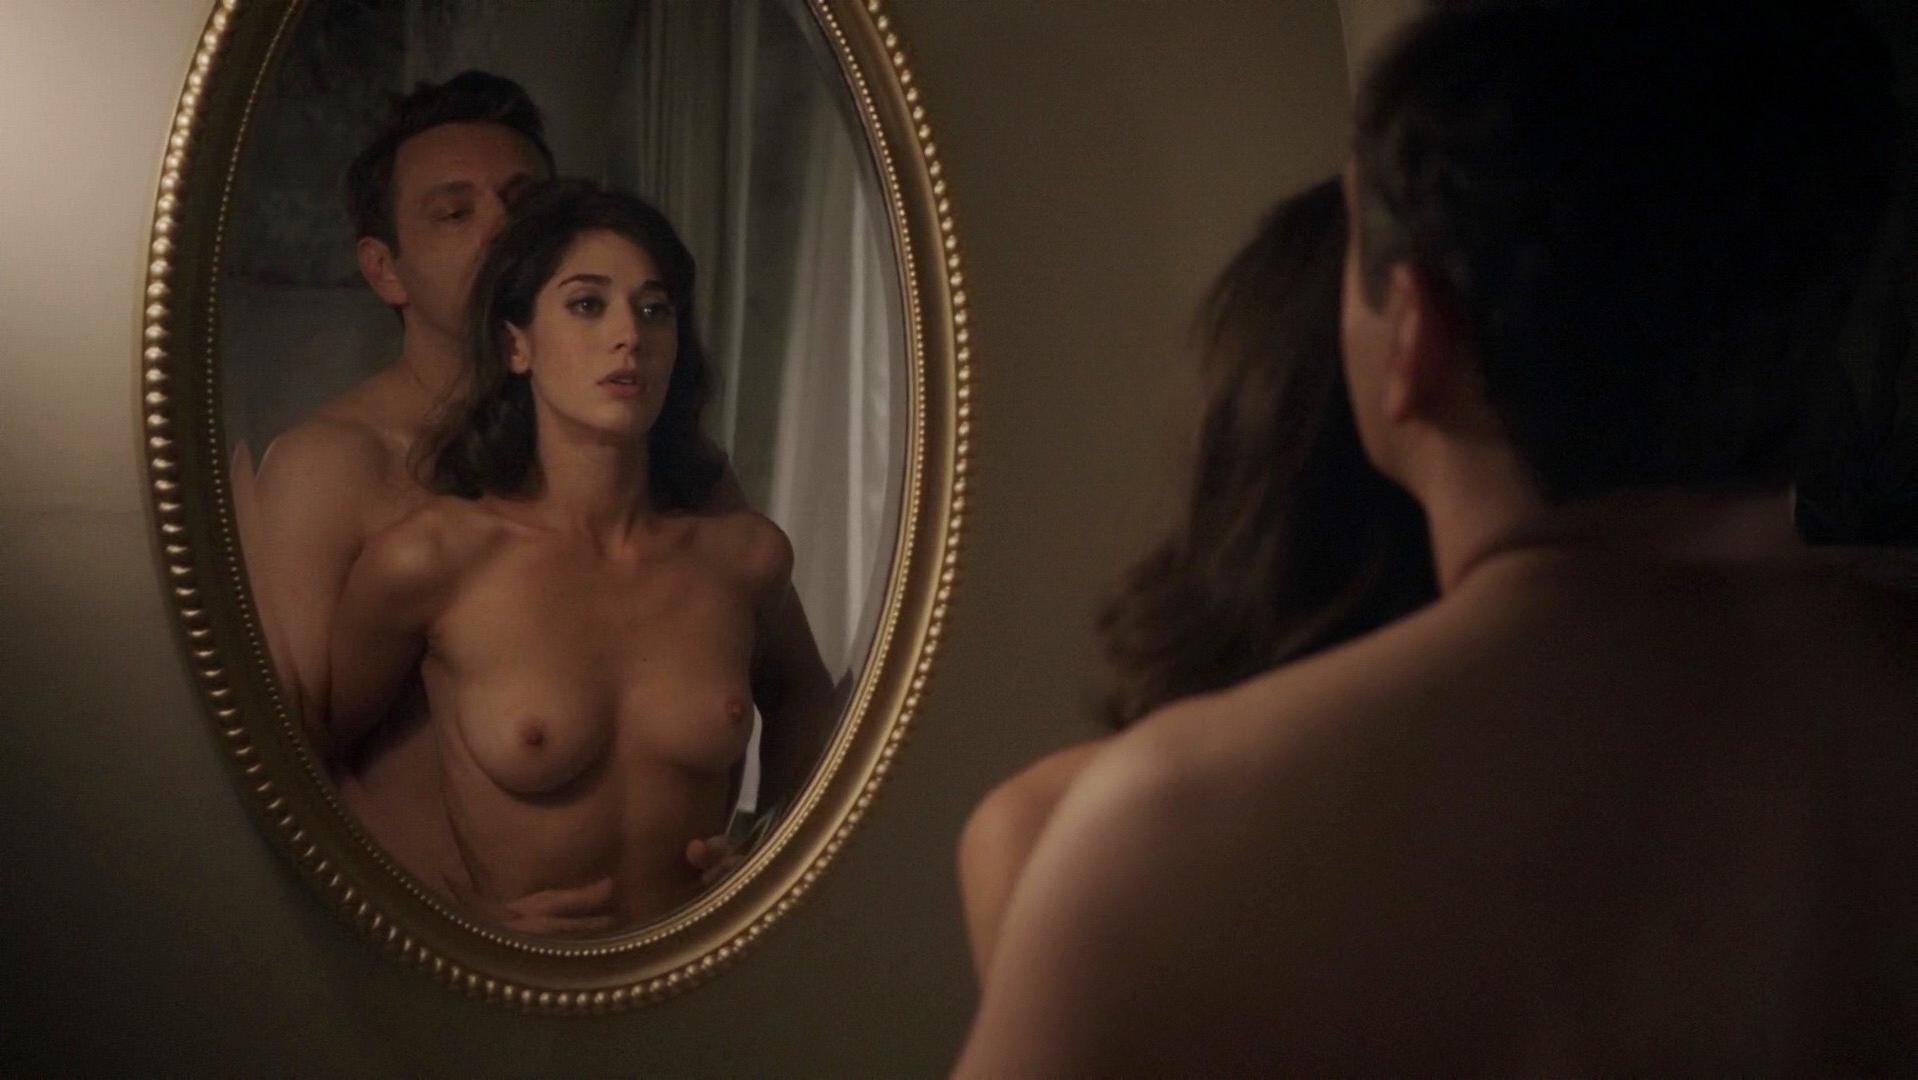 jessica stroup topless